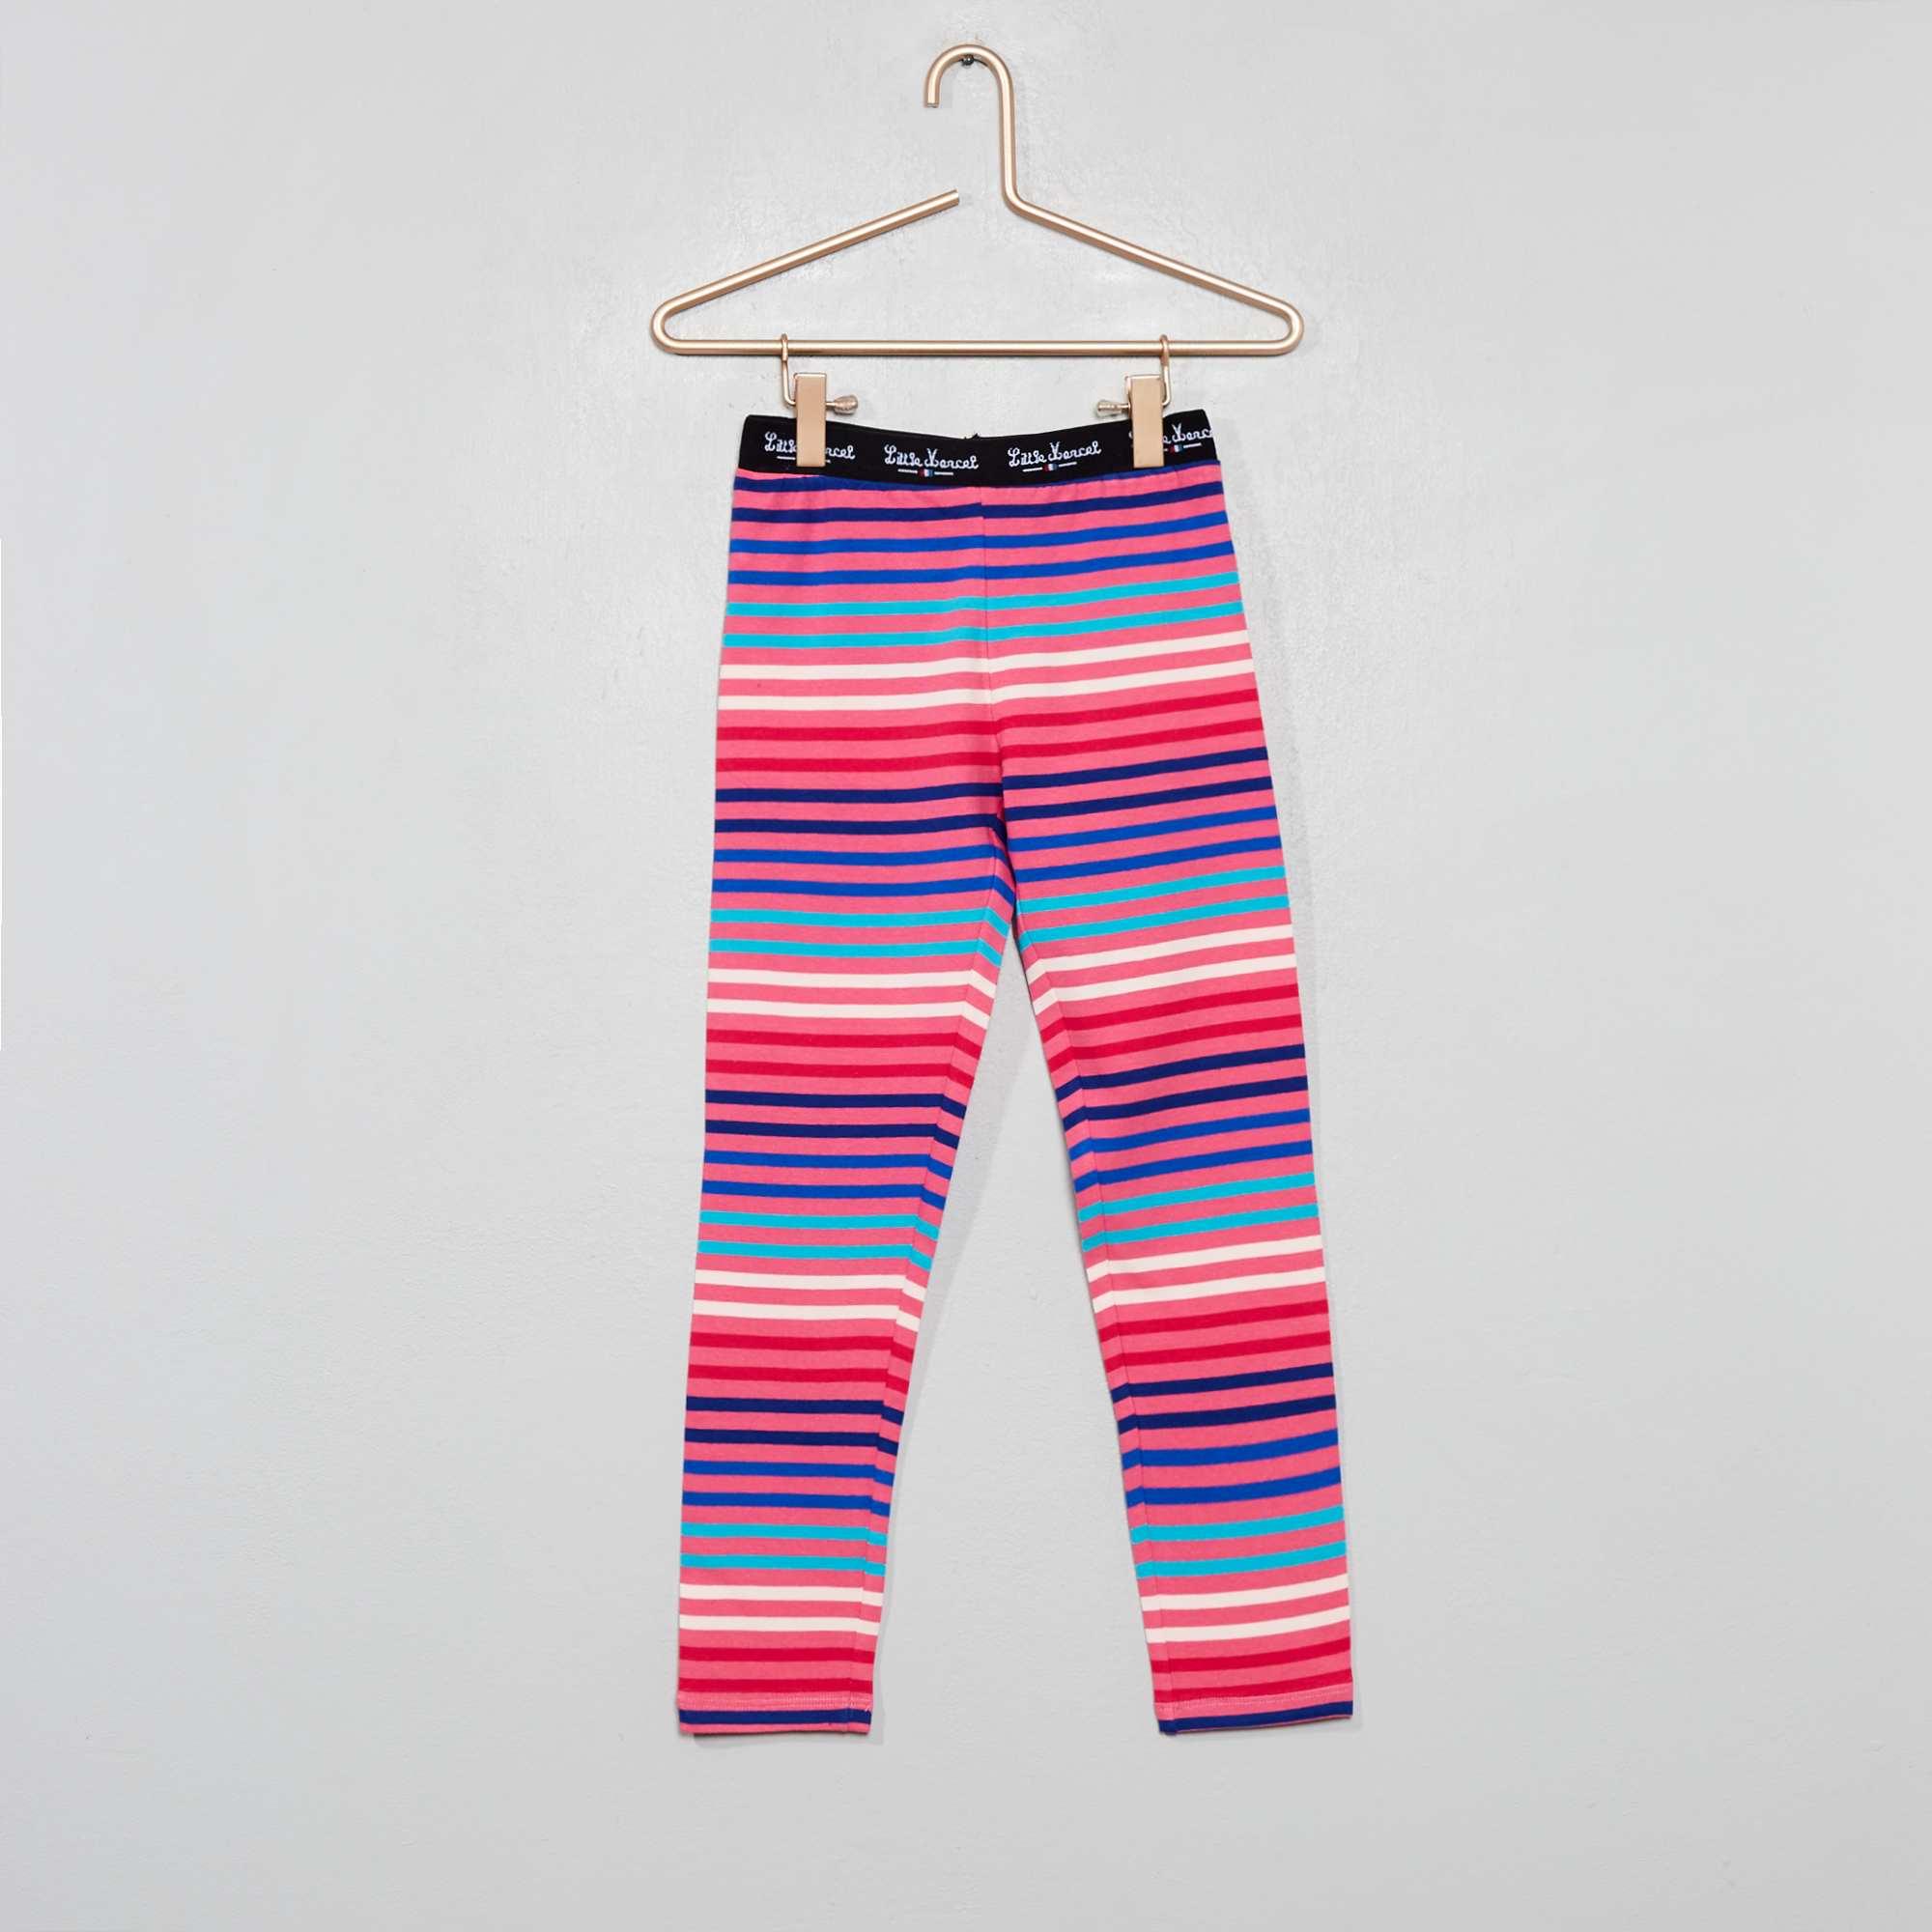 02ec06edb933c Legging rayé 'Little Marcel' Fille - Kiabi - 10,00€